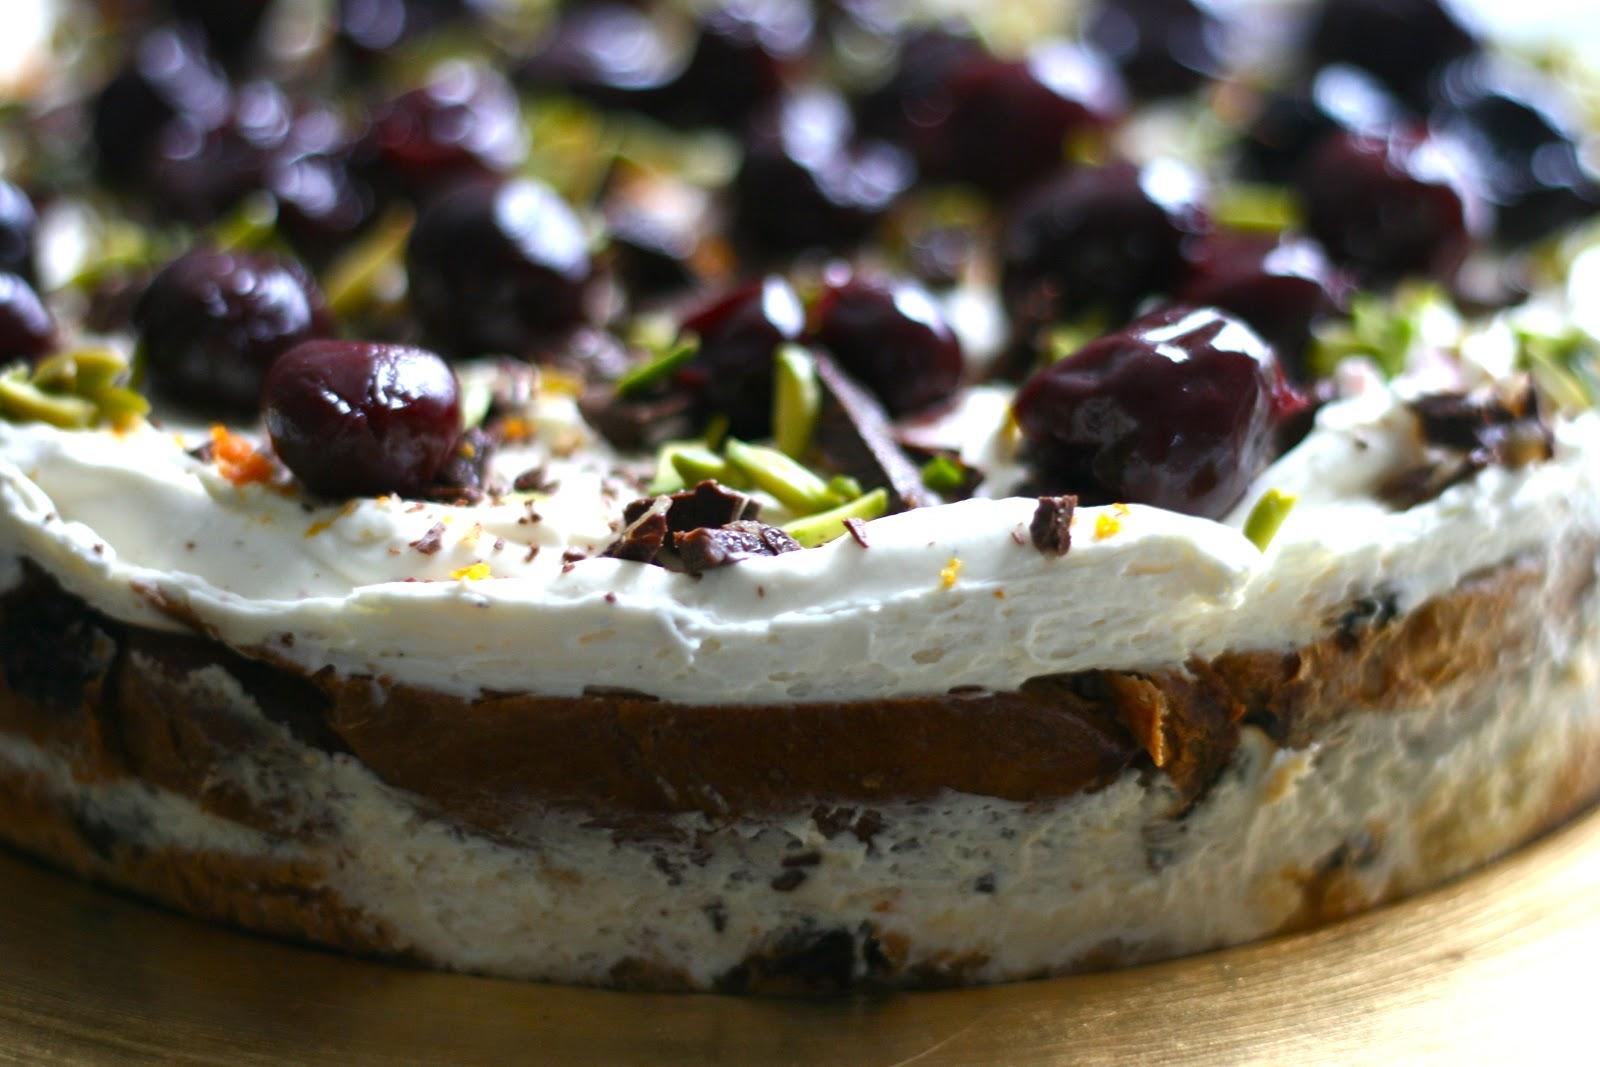 Milli 39 s kitchen nigella 39 s panetonne pudding christmas for Canape jamie oliver